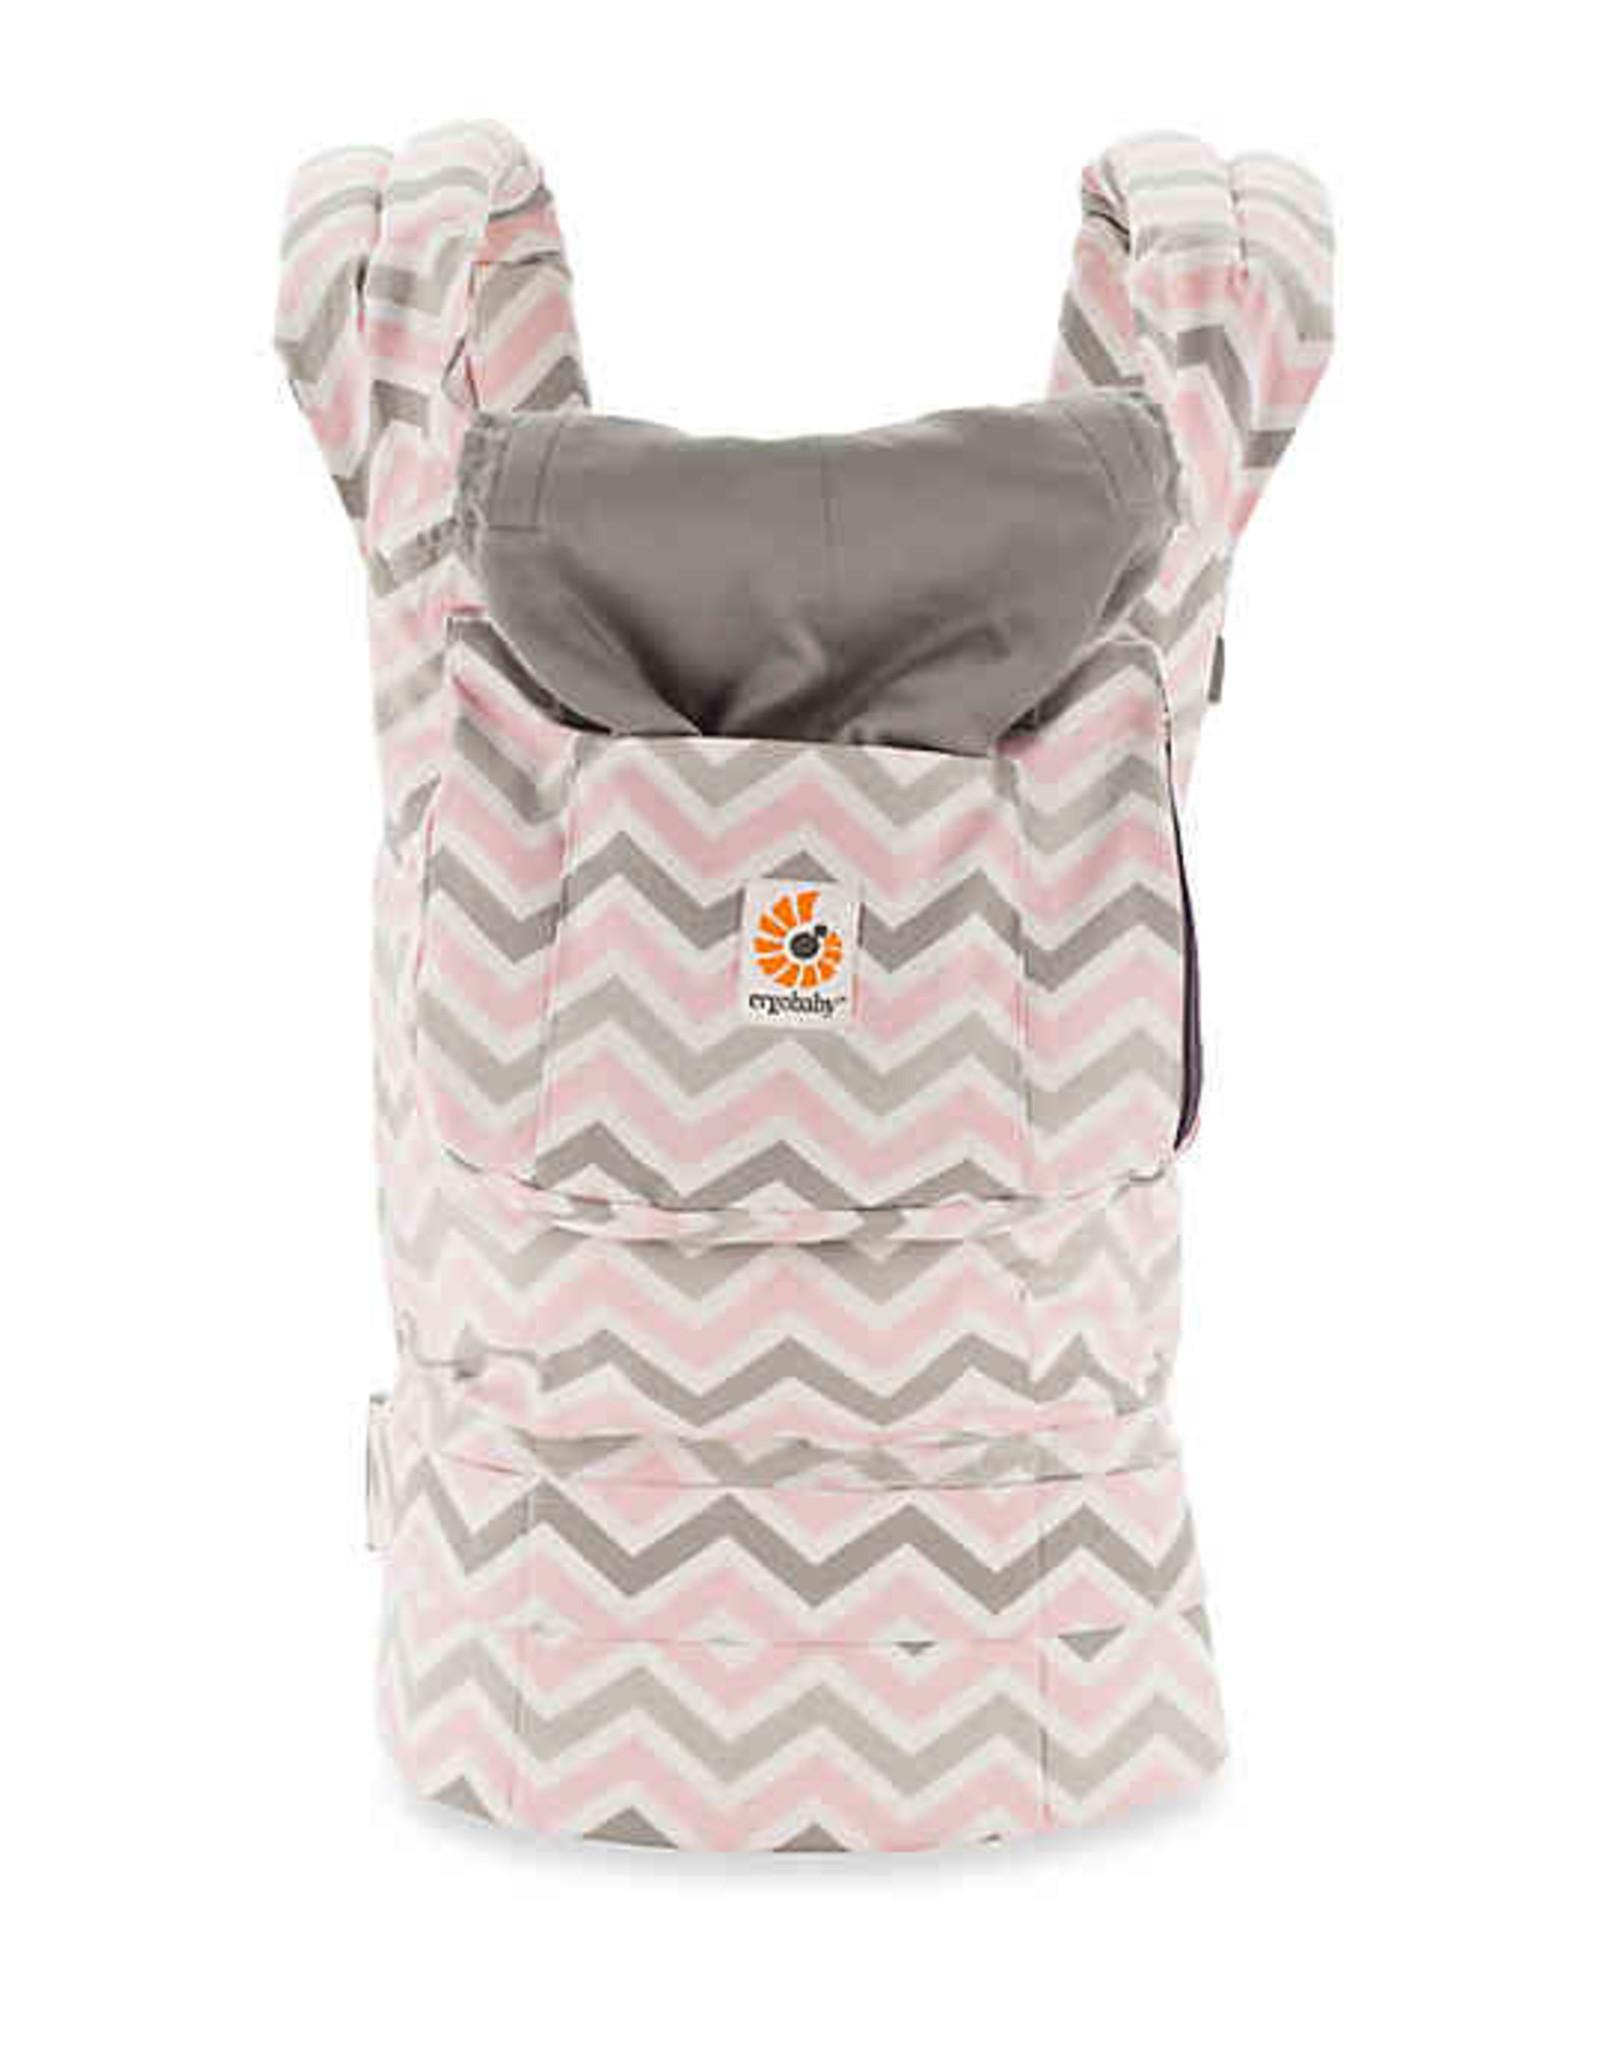 Ergo Baby Original Carrier - Pink Chevron